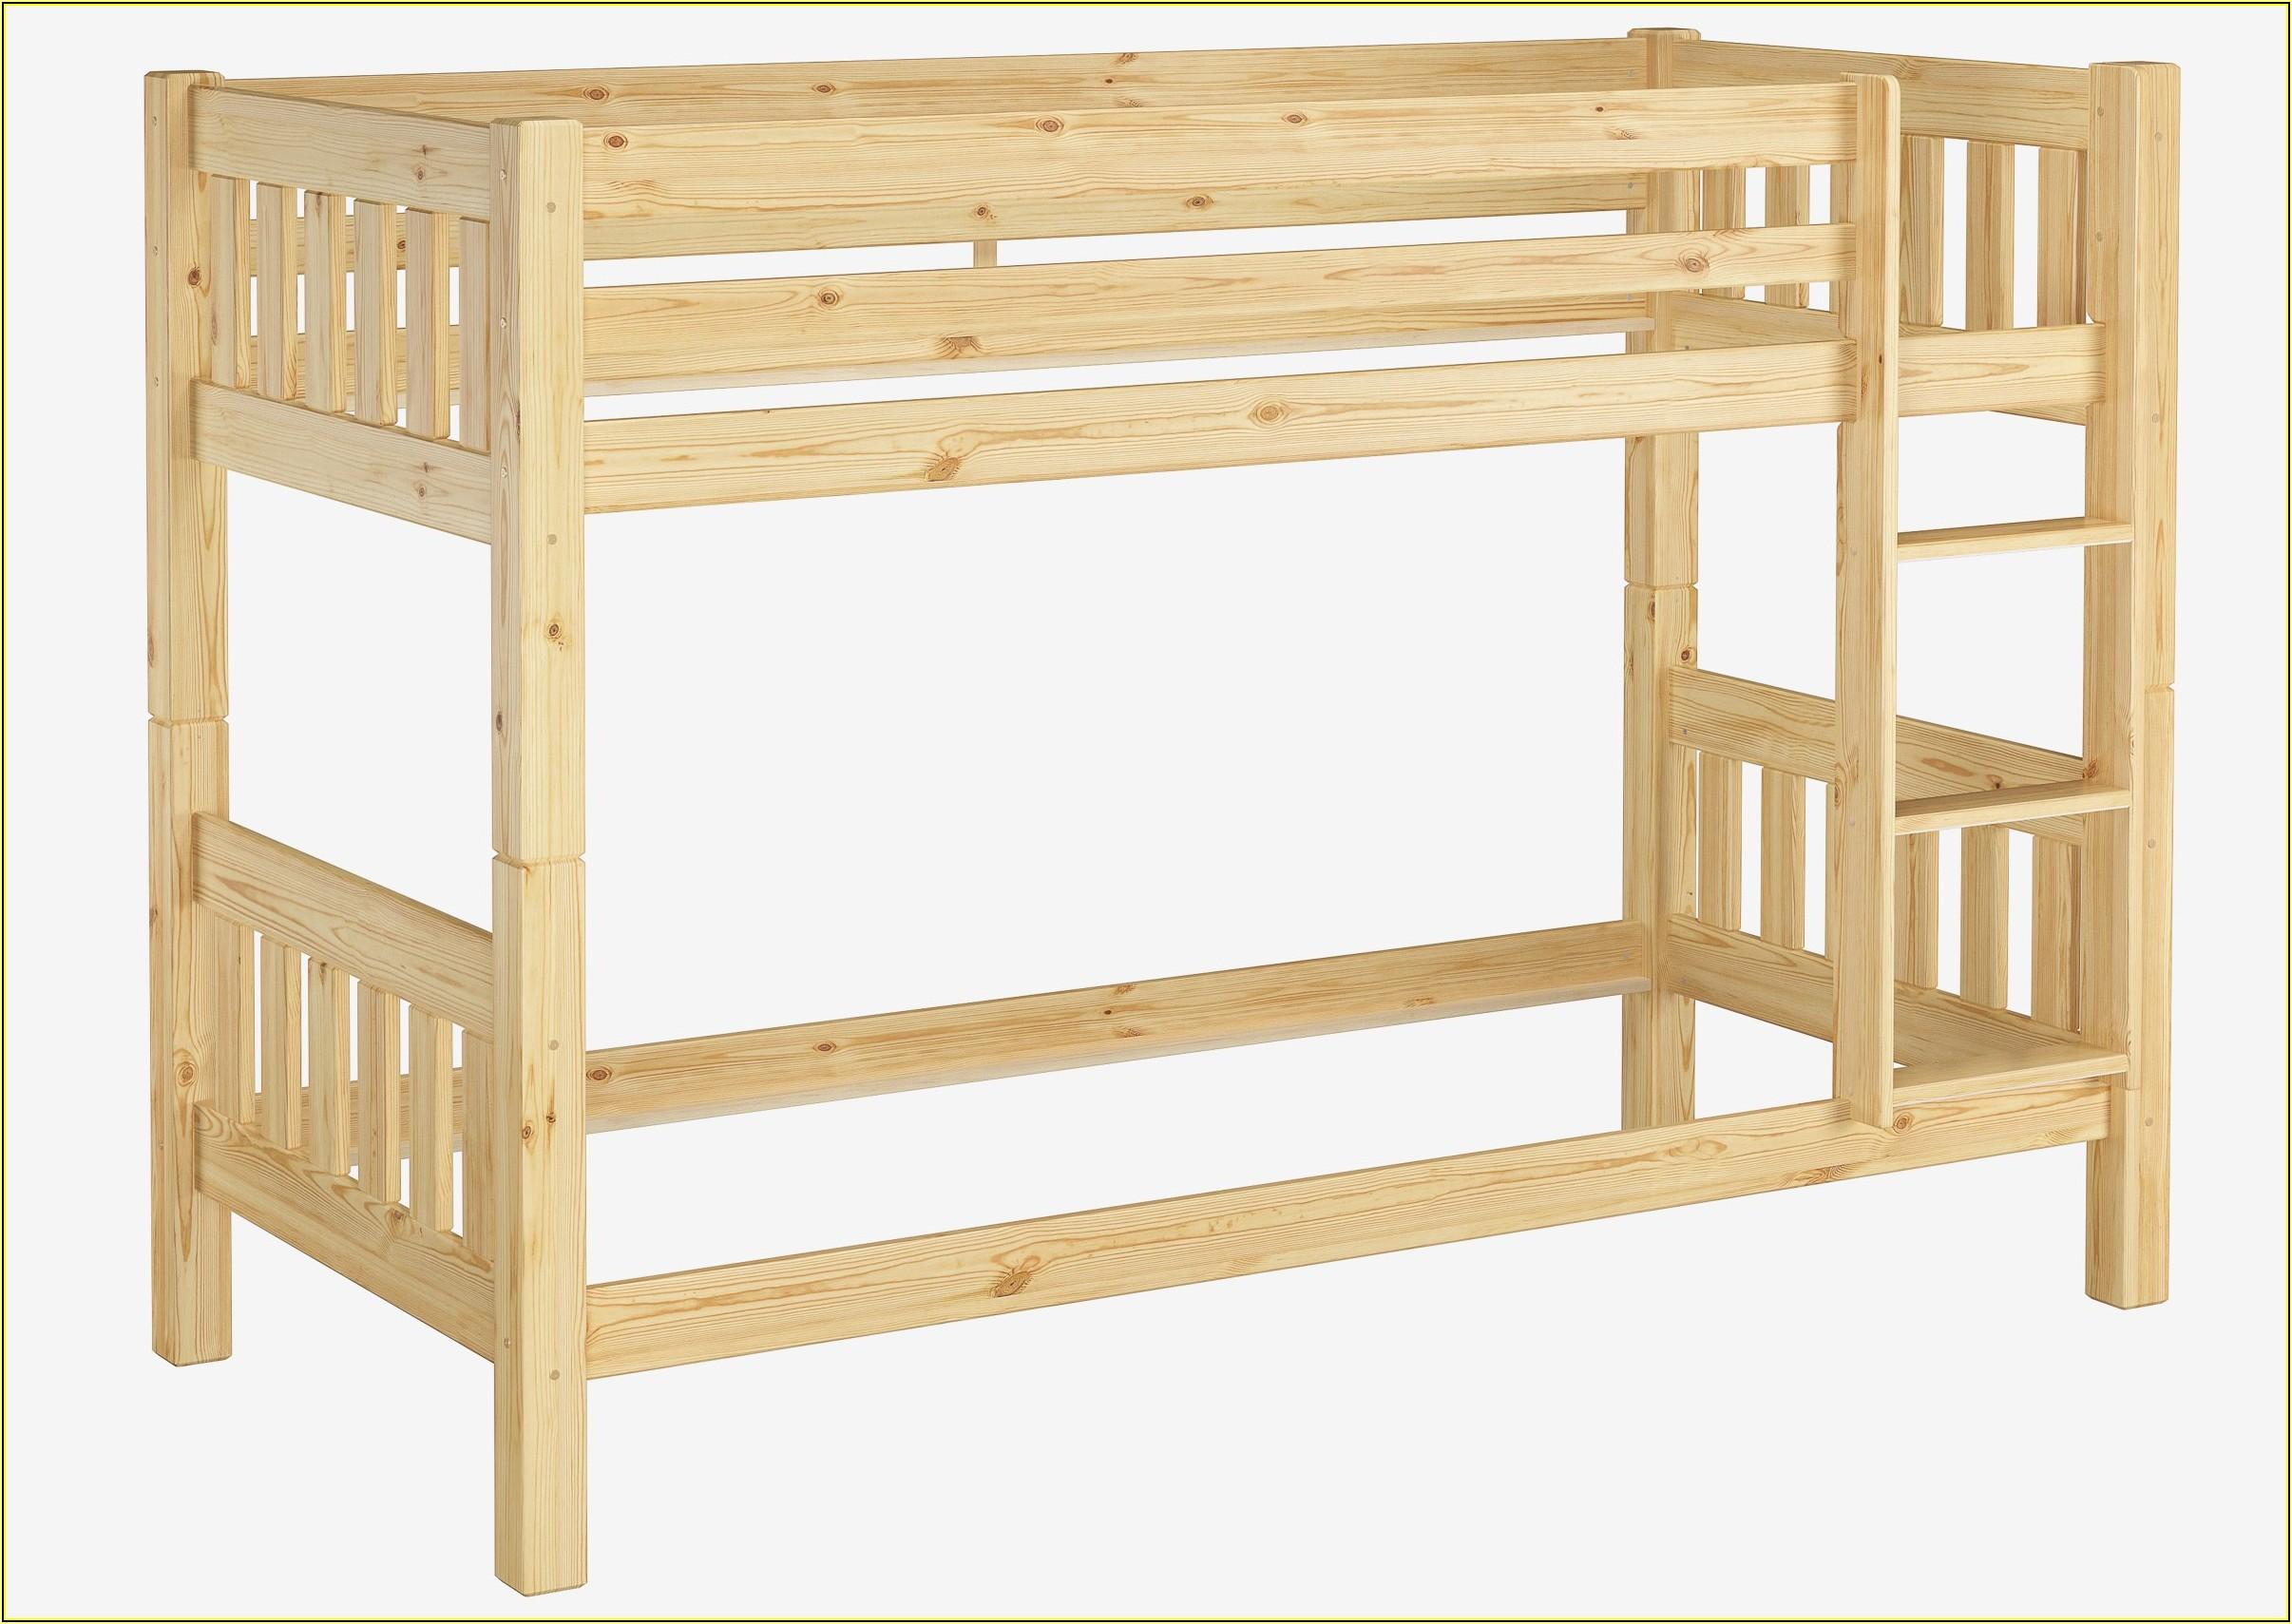 Playmobil Kinderzimmer Mit Stockbett 5328